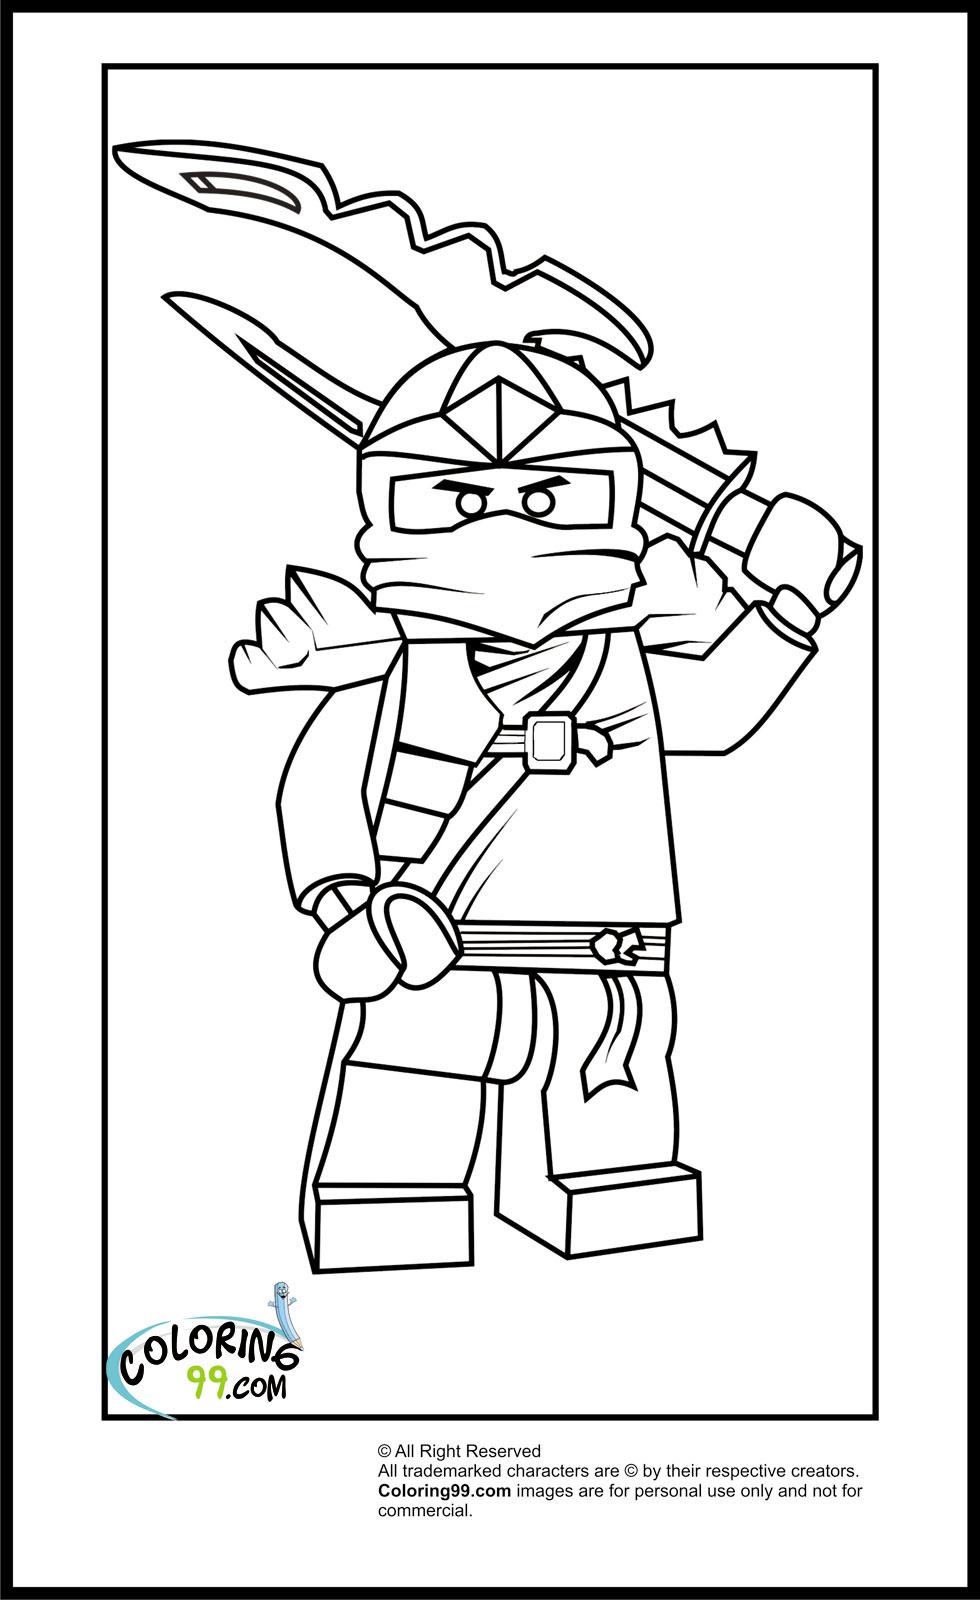 Coloriage ninjago gratuit - dessin a imprimer #87